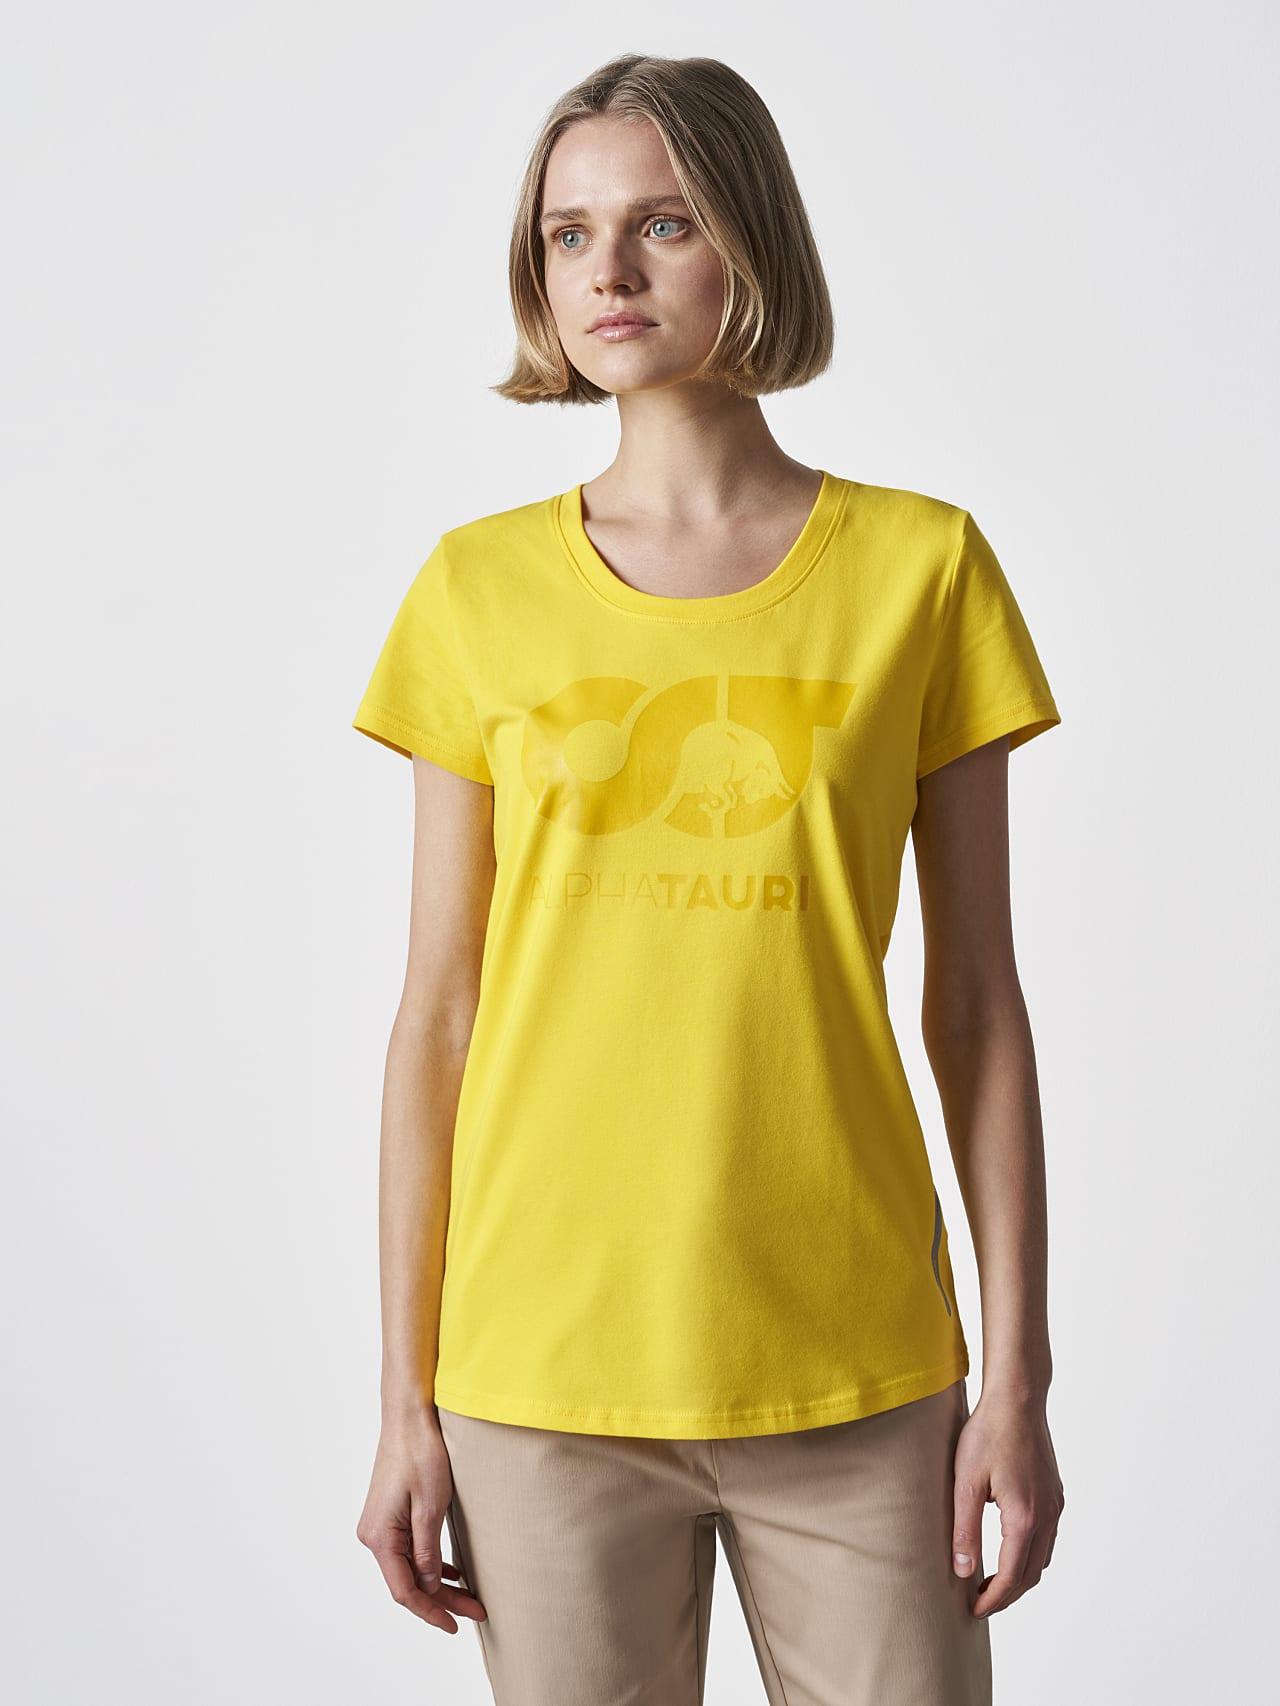 JERU V2.Y4.02 Signature Logo T-Shirt yellow Model shot Alpha Tauri